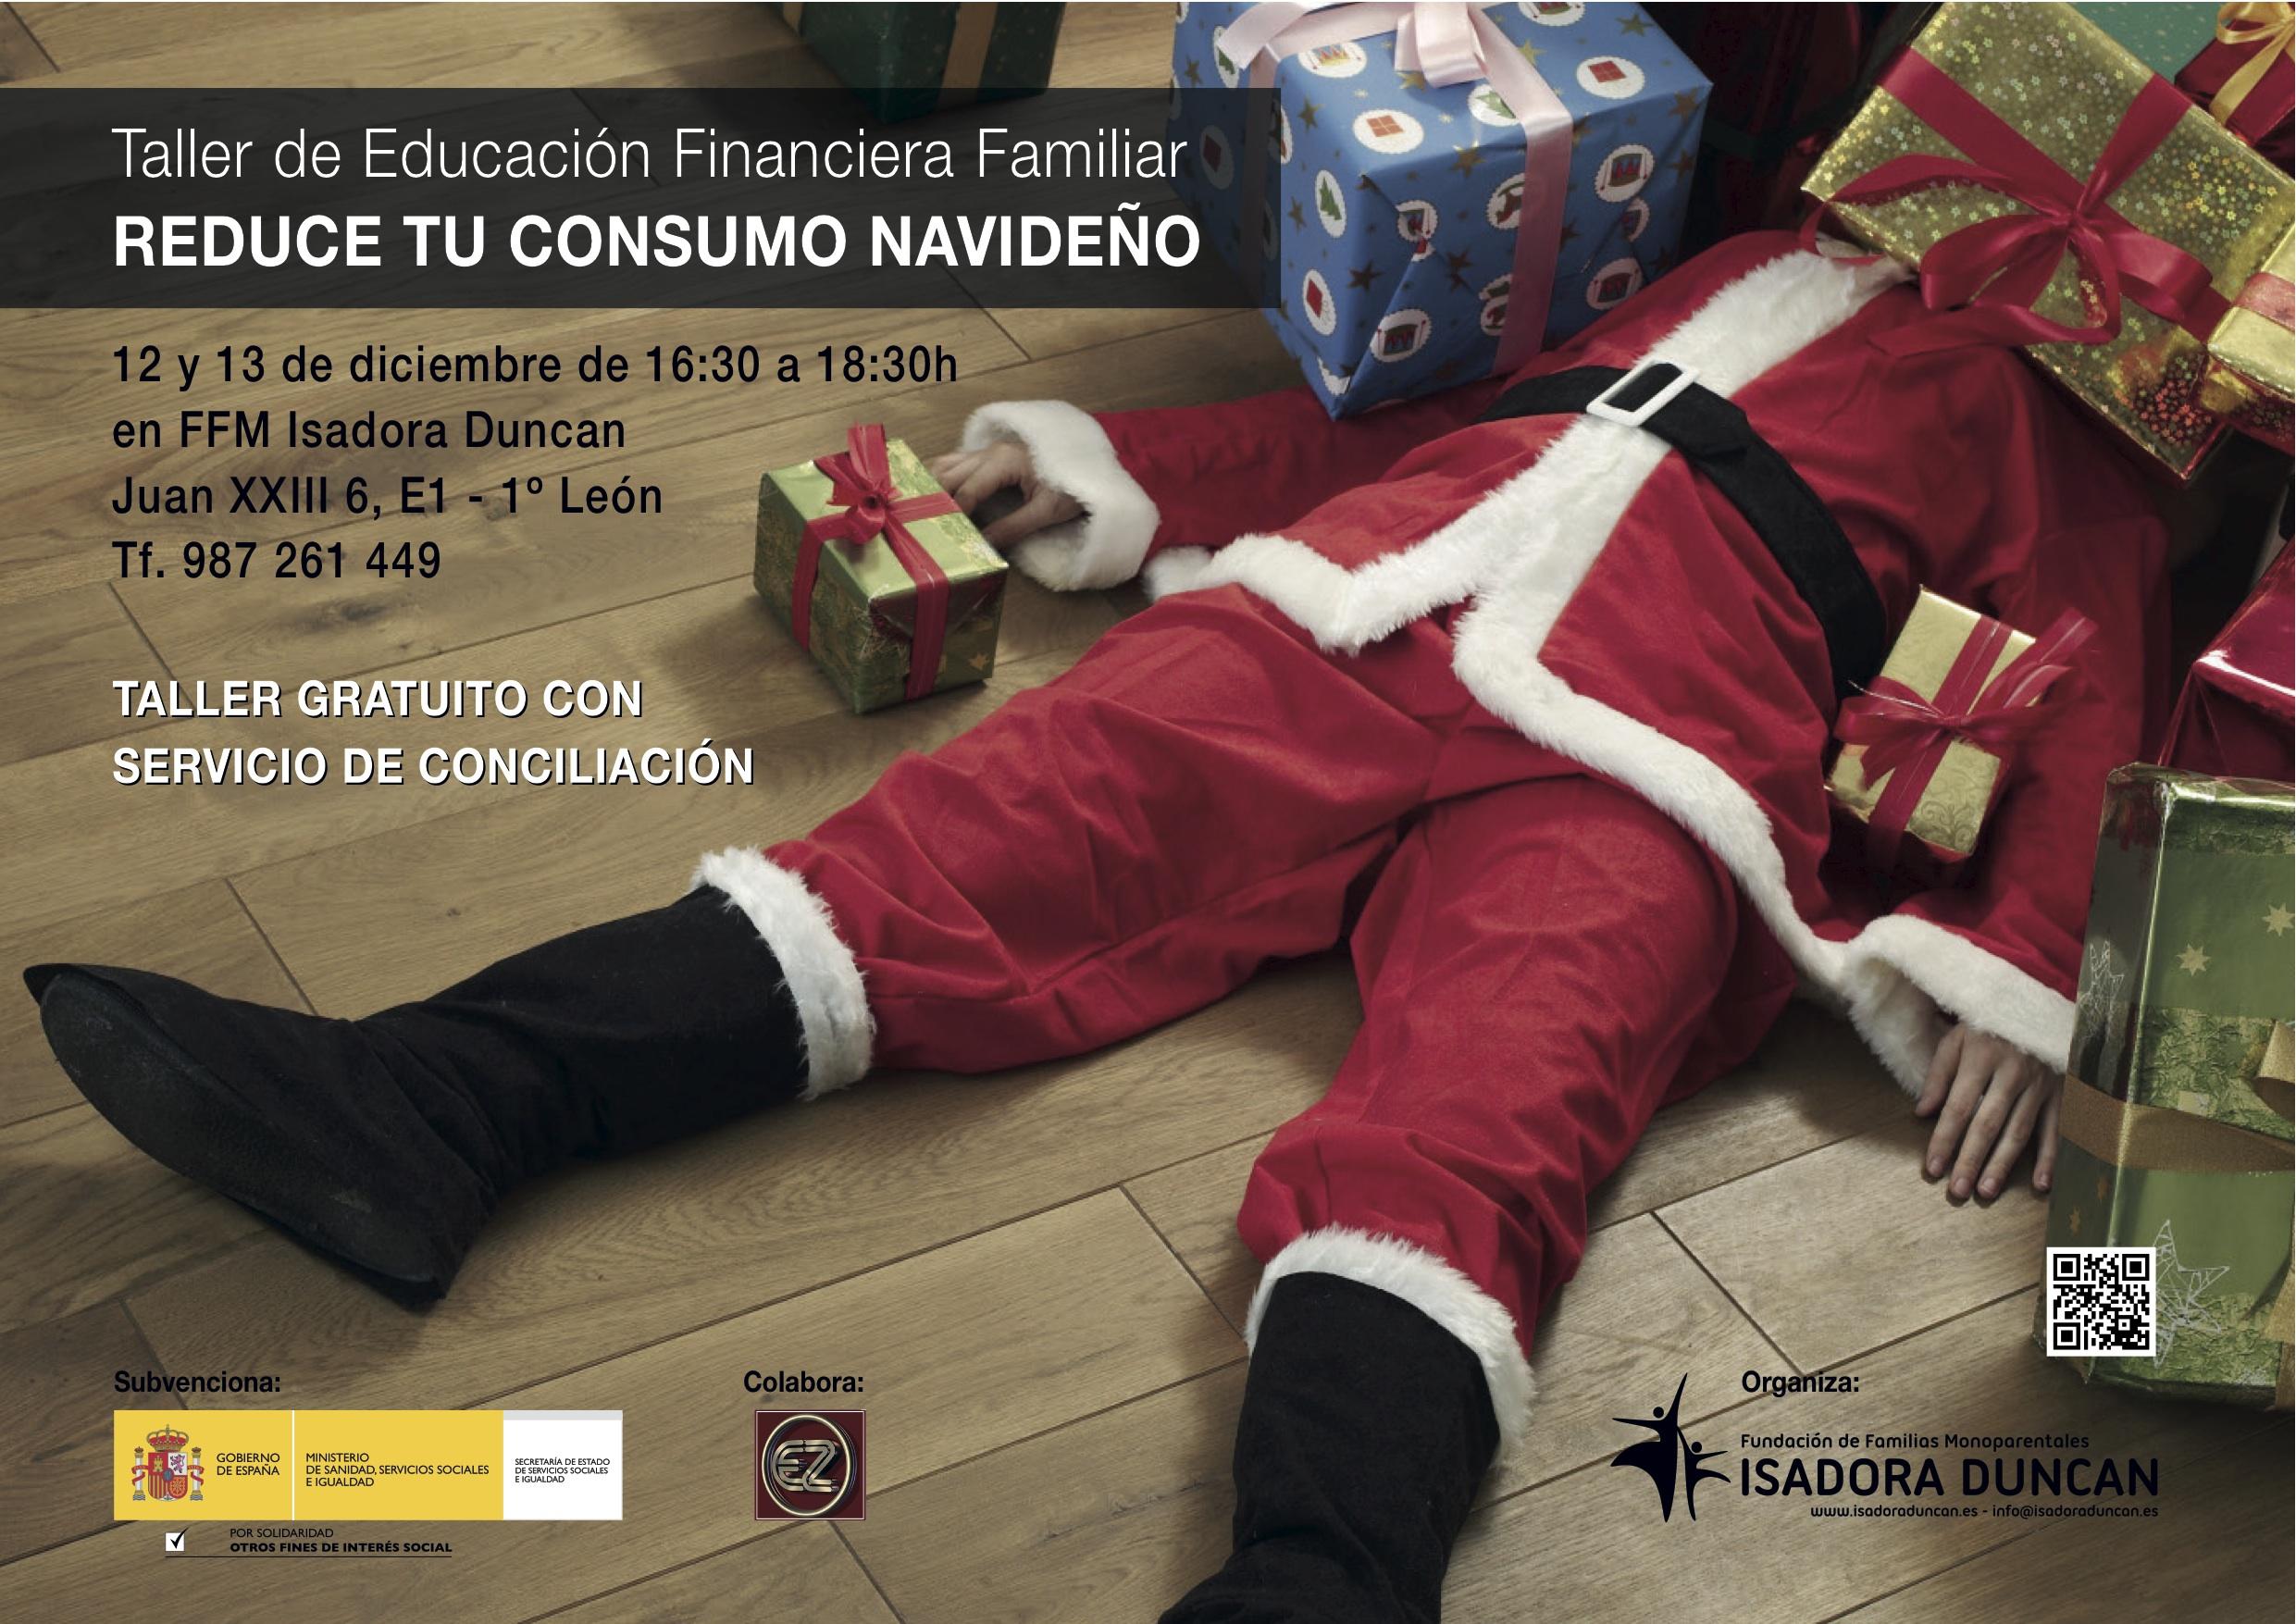 Reduce tu consumo navideño